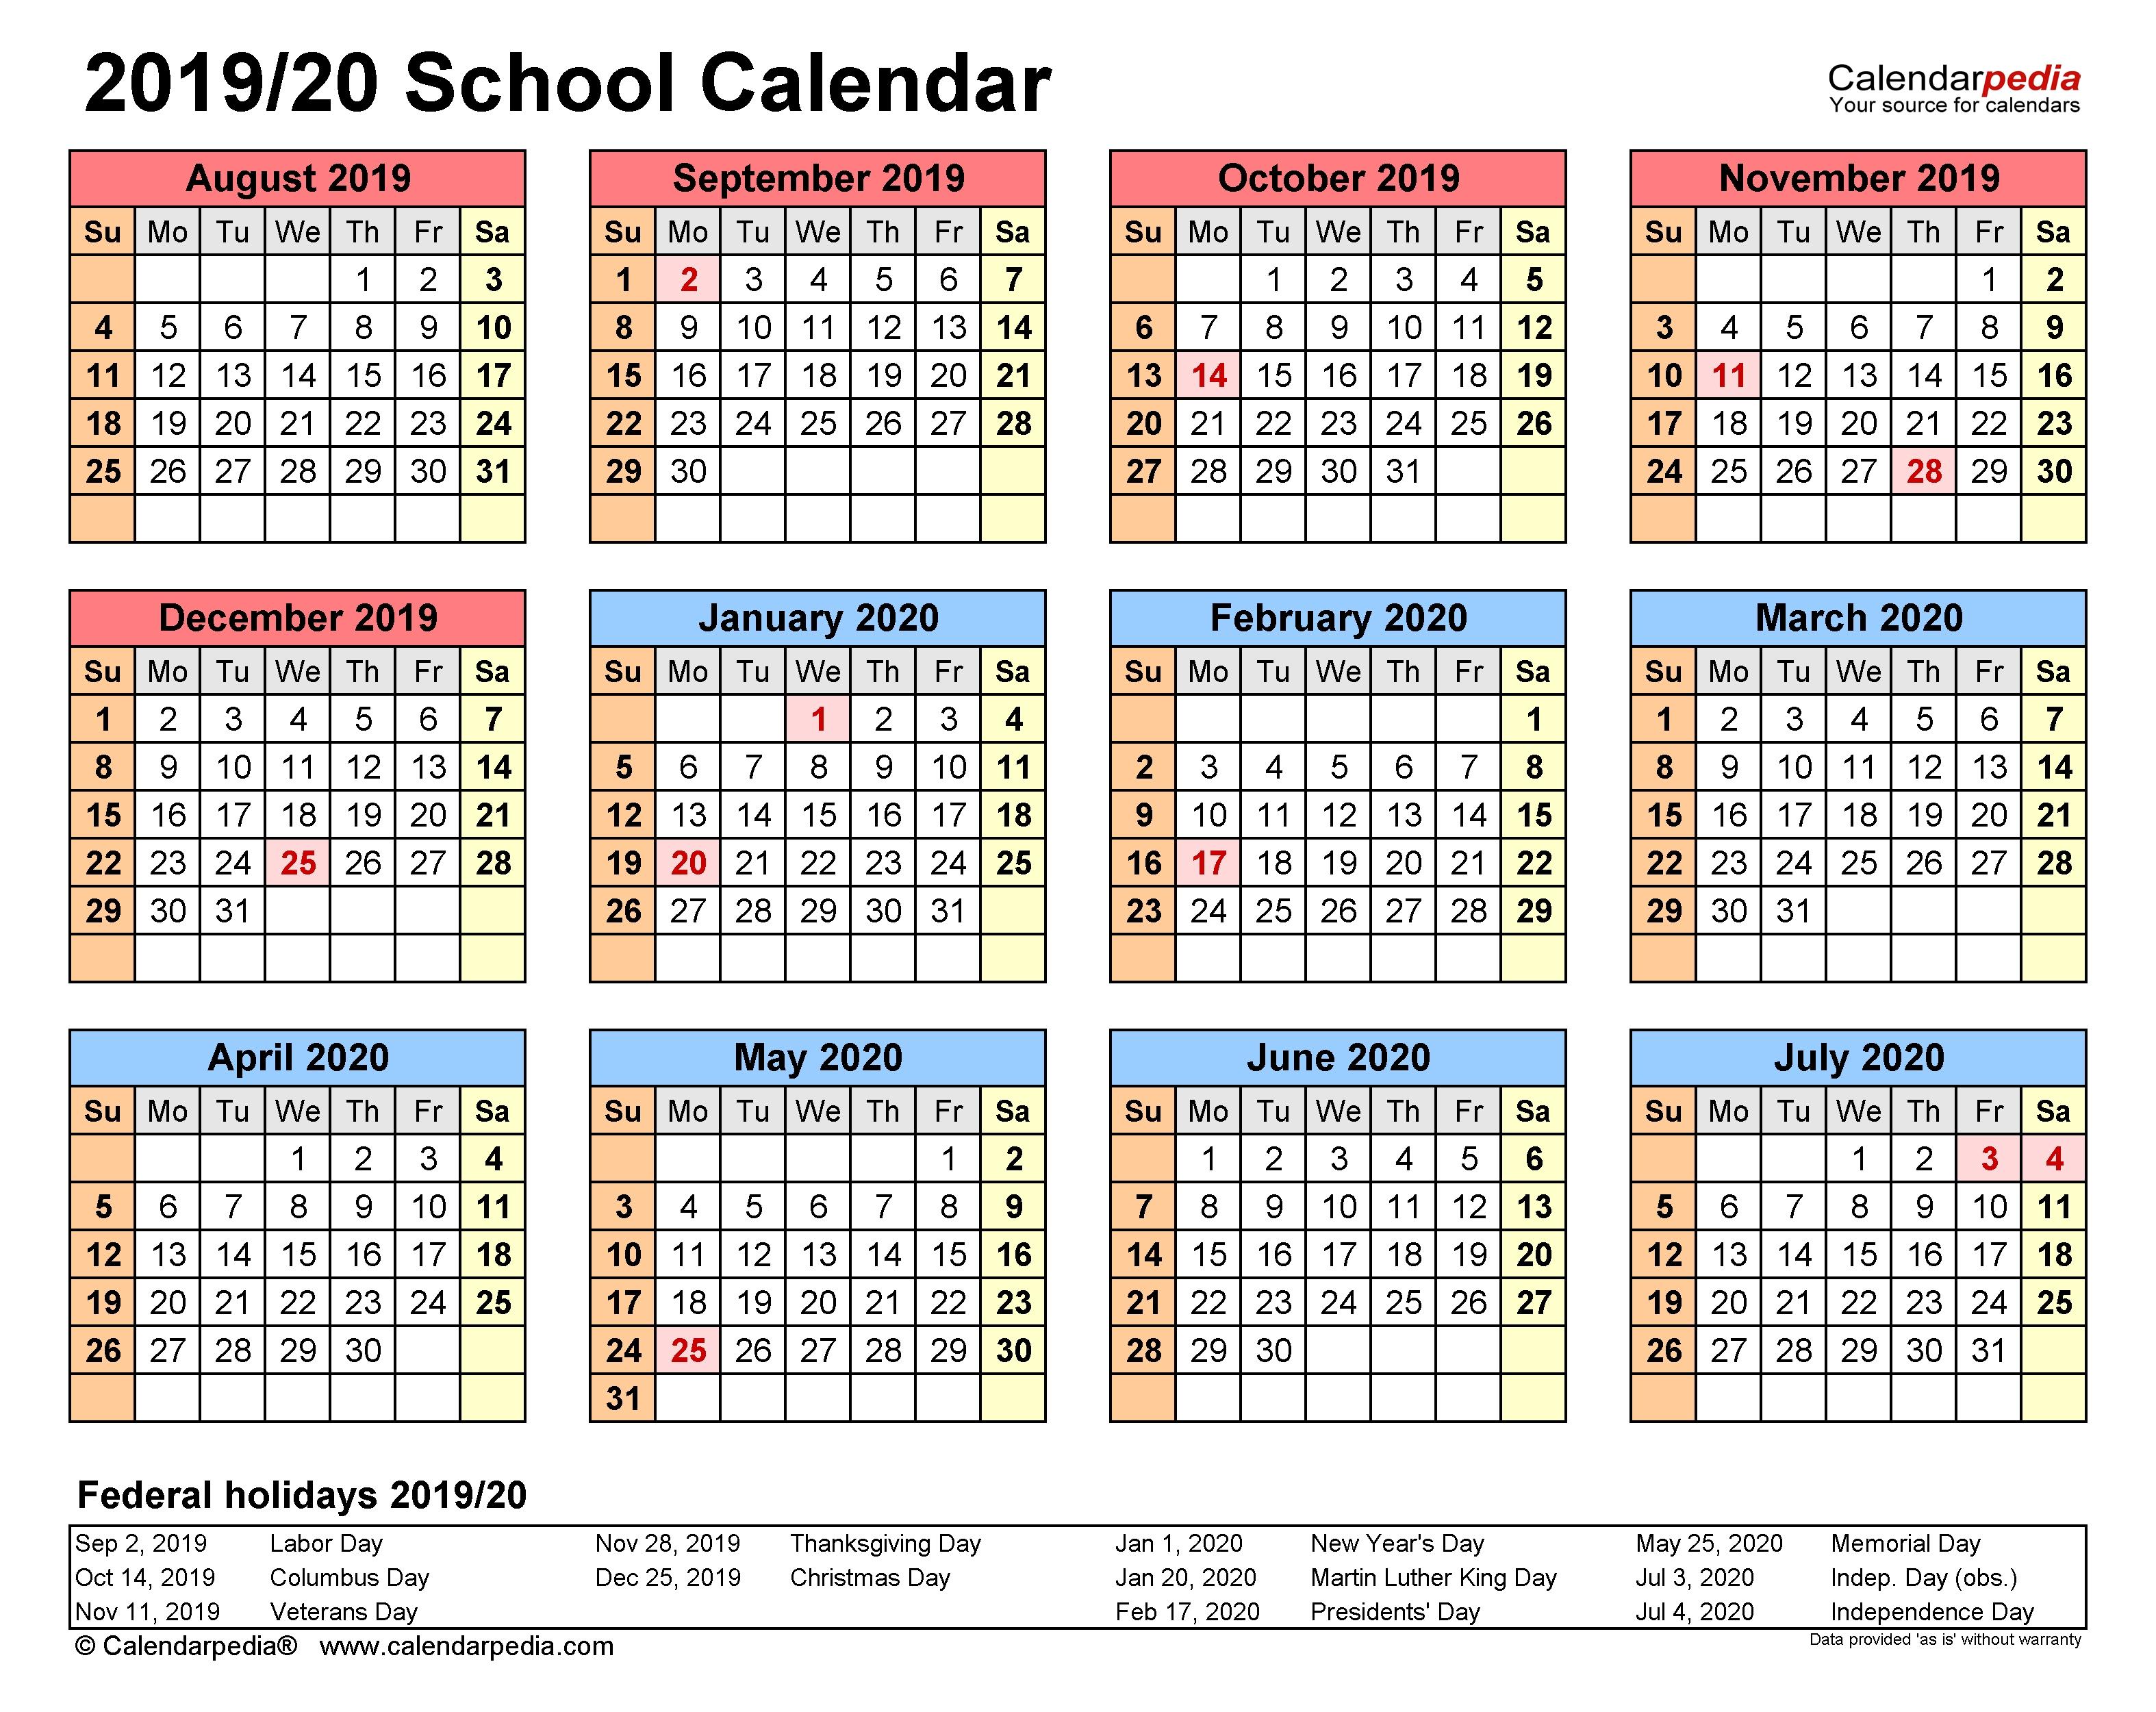 School Calendars 2019/2020 - Free Printable Word Templates within Free Printable Academic Calendar 2019-2020